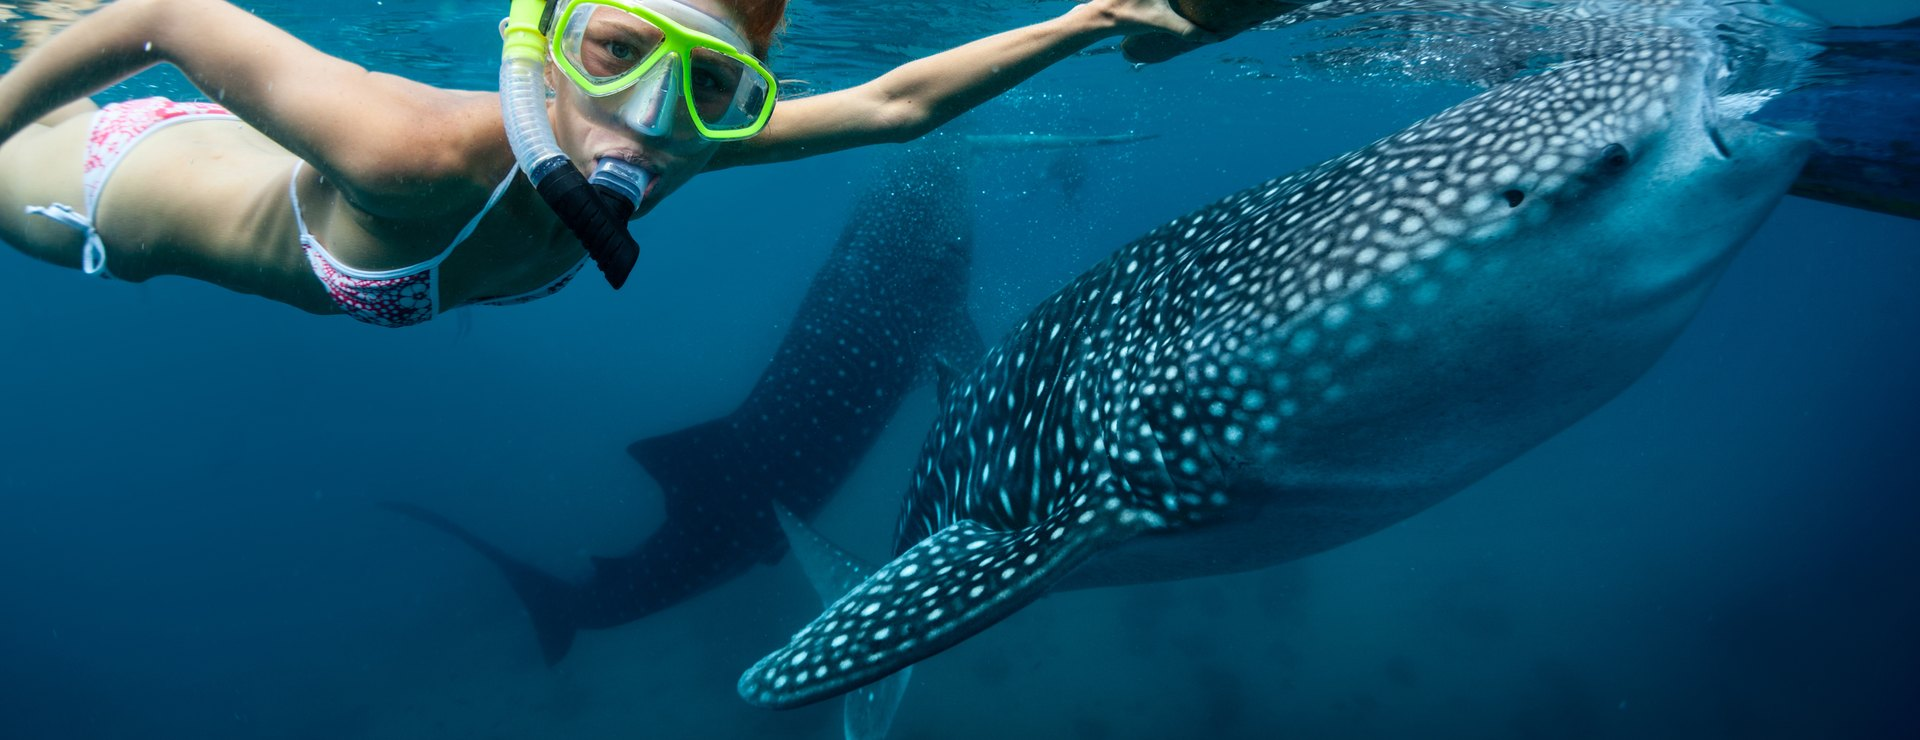 The whale shark pod of Thanda Island Image 1